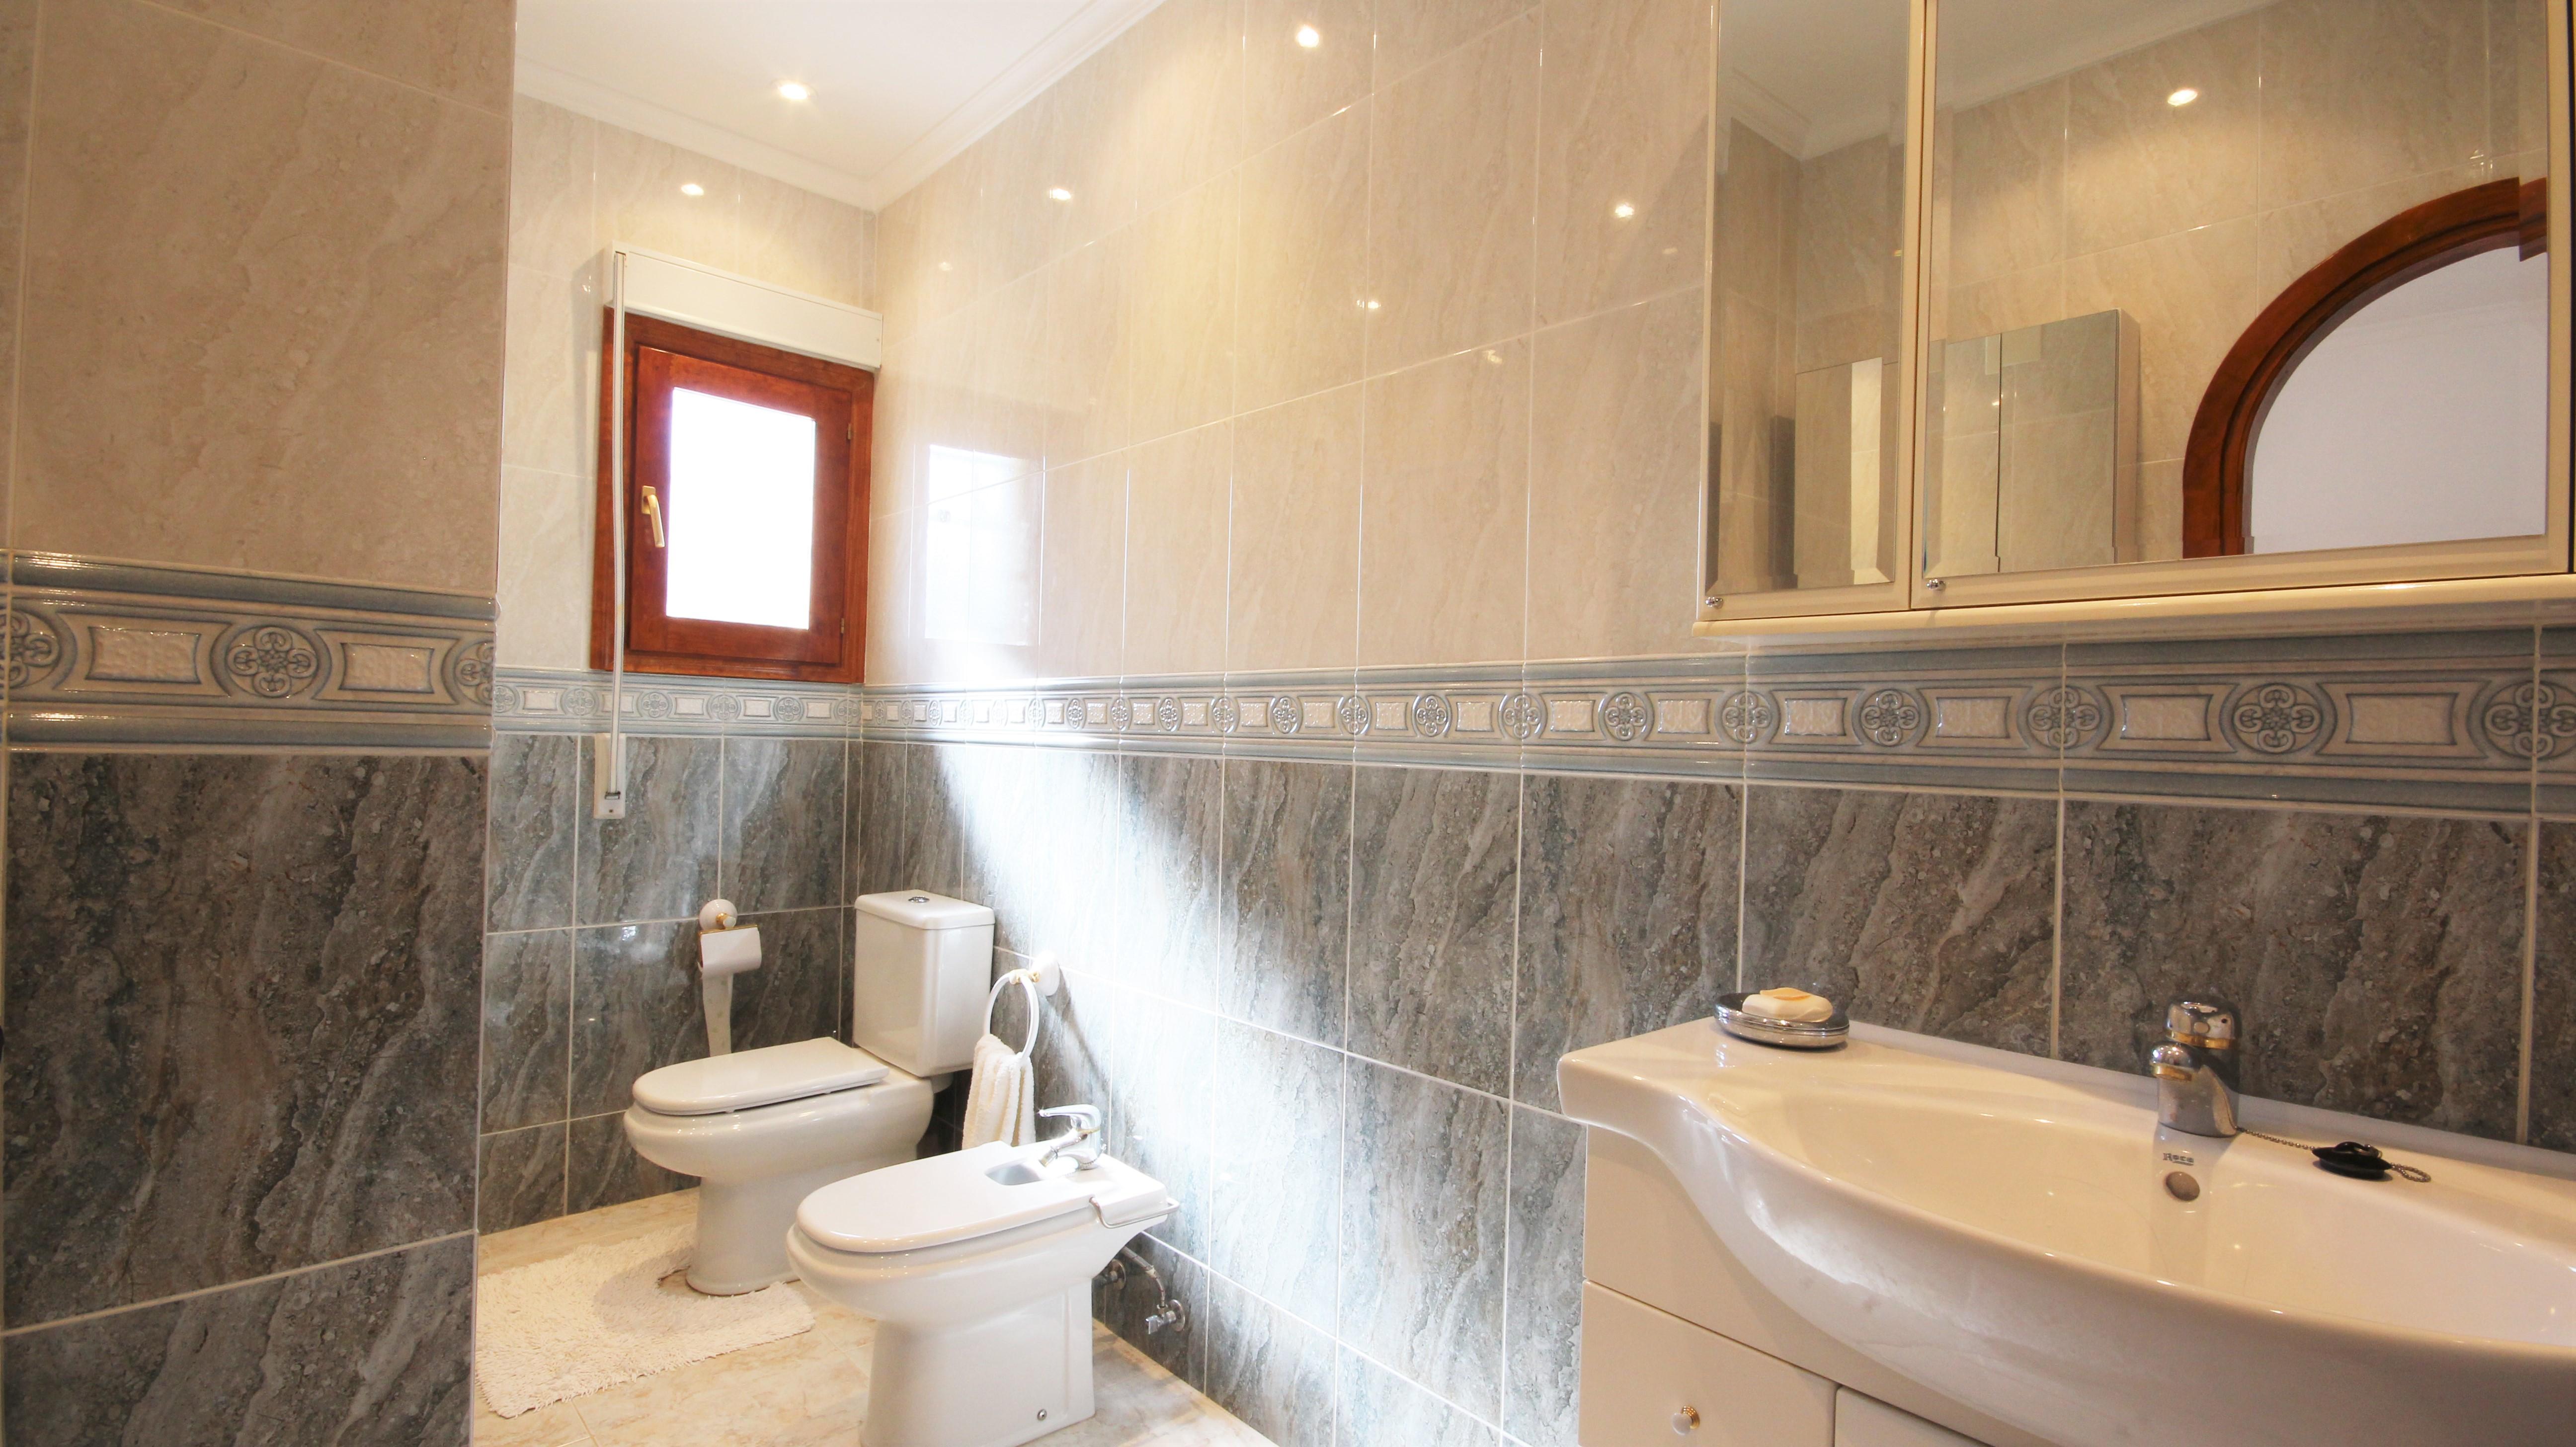 4 bedroom house / villa for sale in Parcent, Costa Blanca